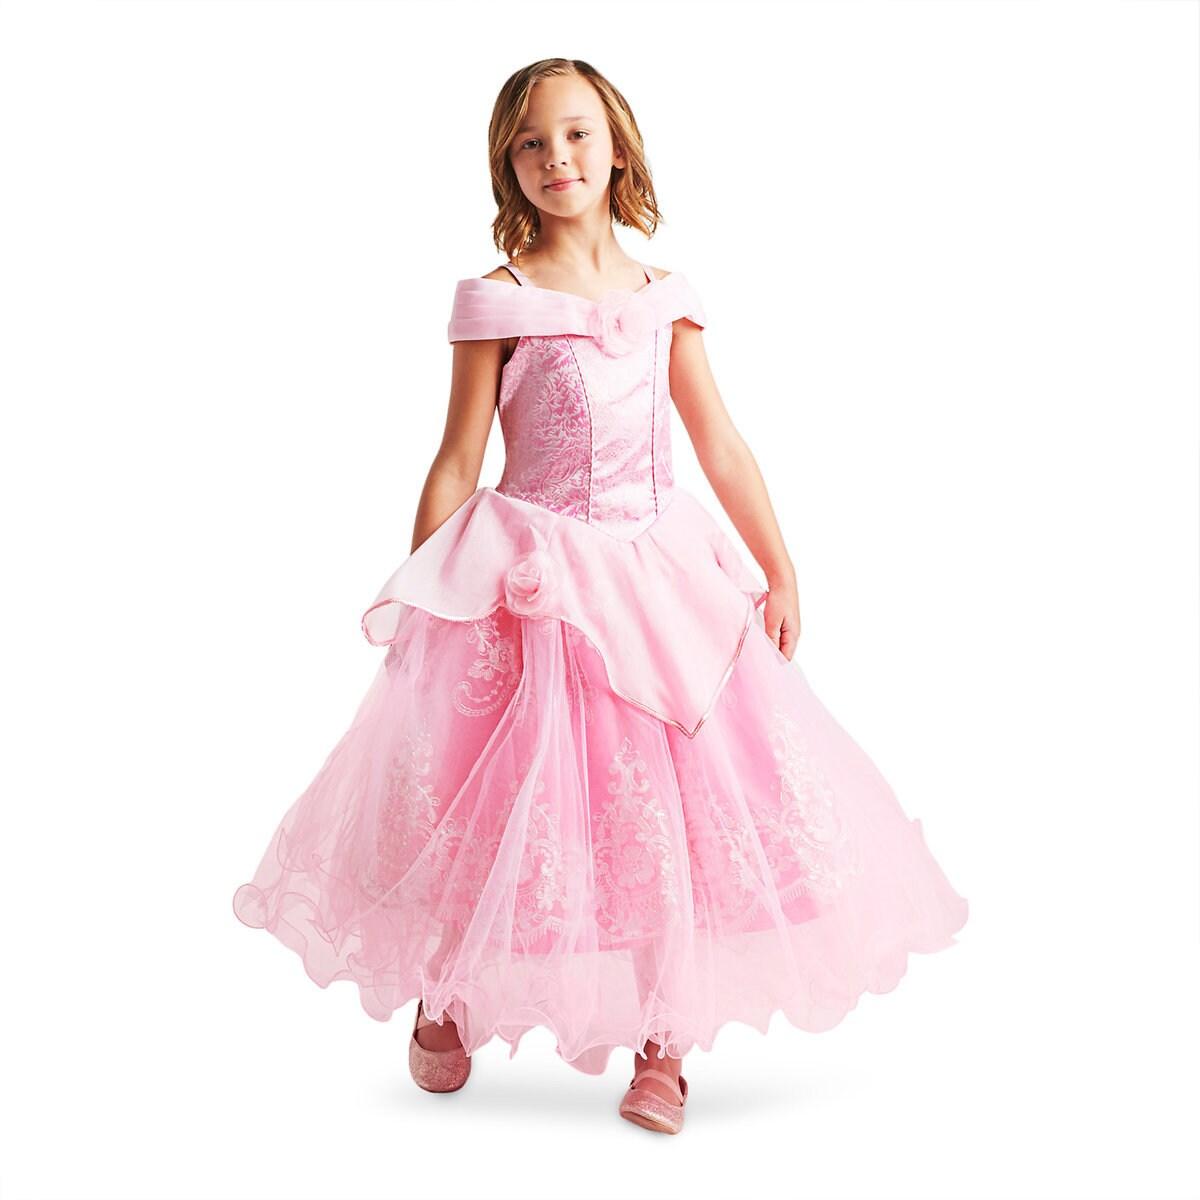 cac6b2373f6a Aurora Signature Costume for Girls